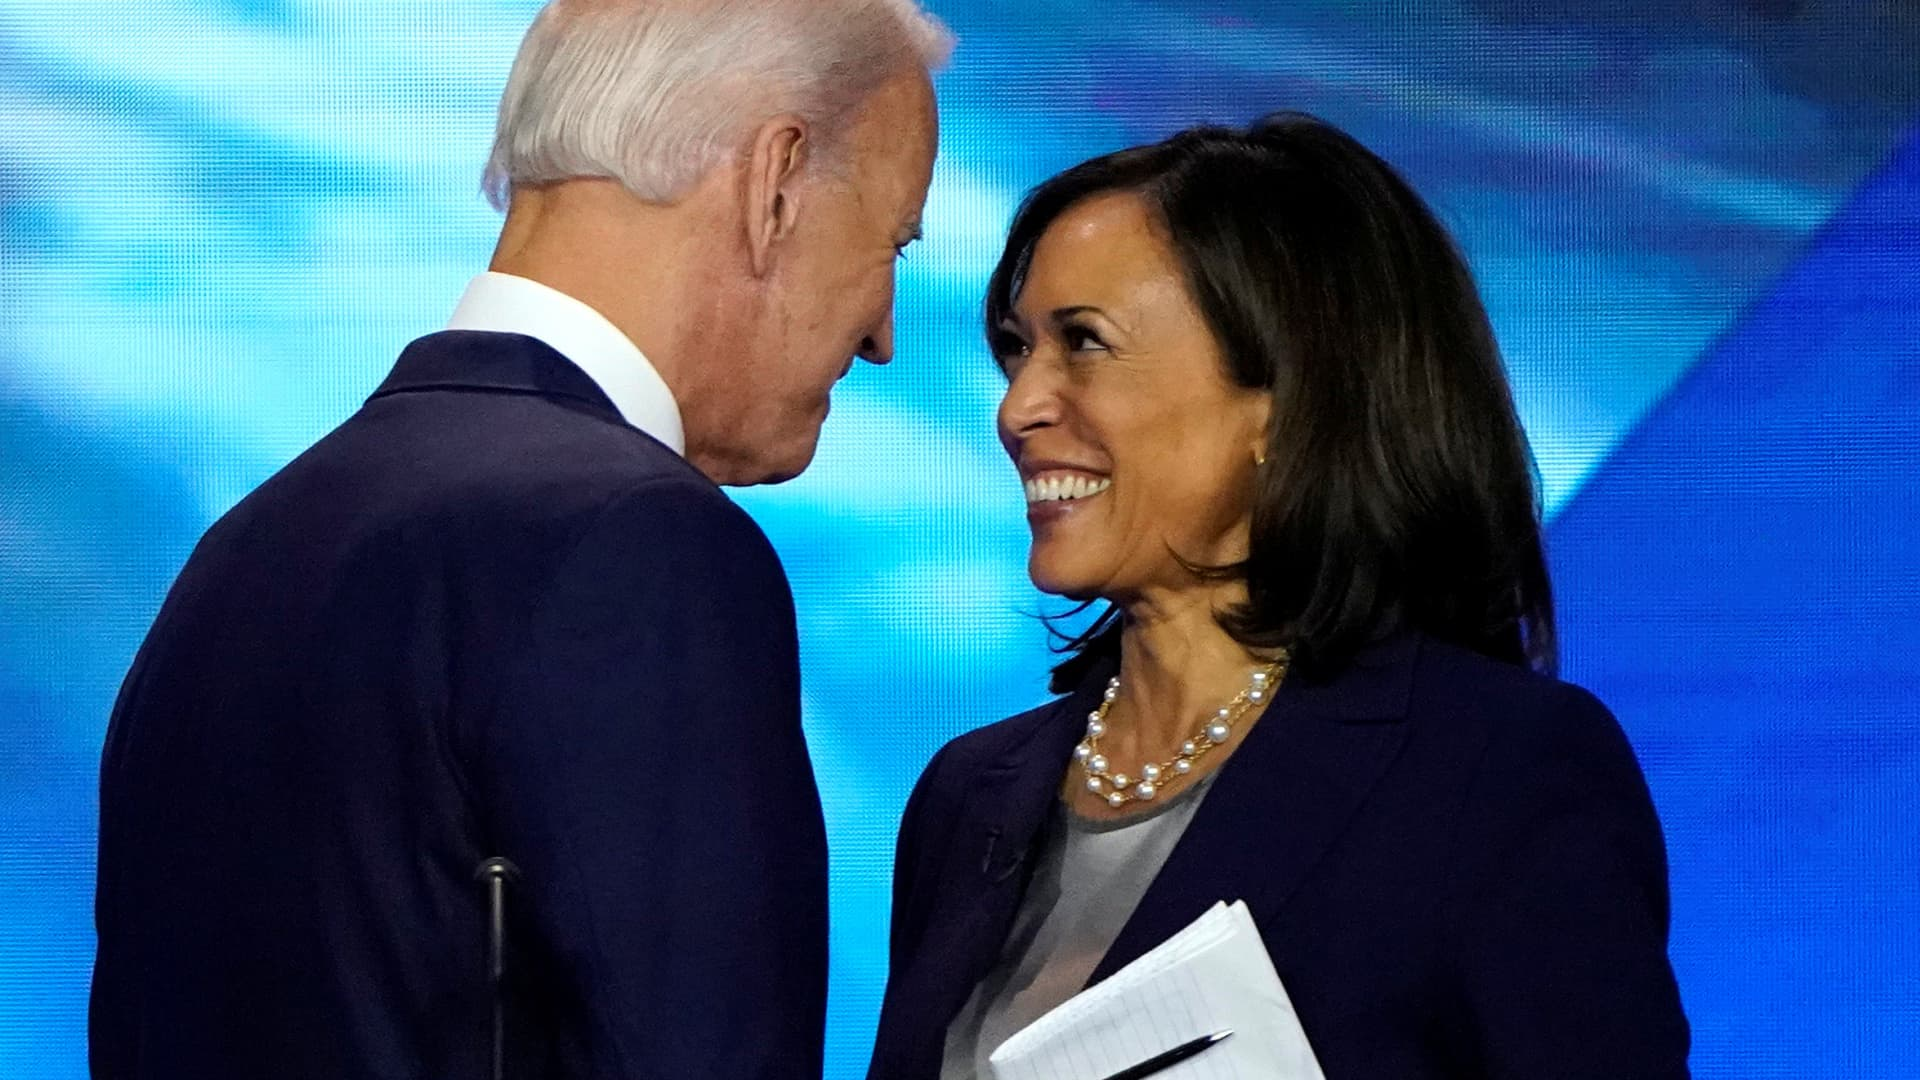 Former Vice President Joe Biden talks with Senator Kamala Harris after the conclusion of the 2020 Democratic U.S. presidential debate in Houston, Texas, September 12, 2019.